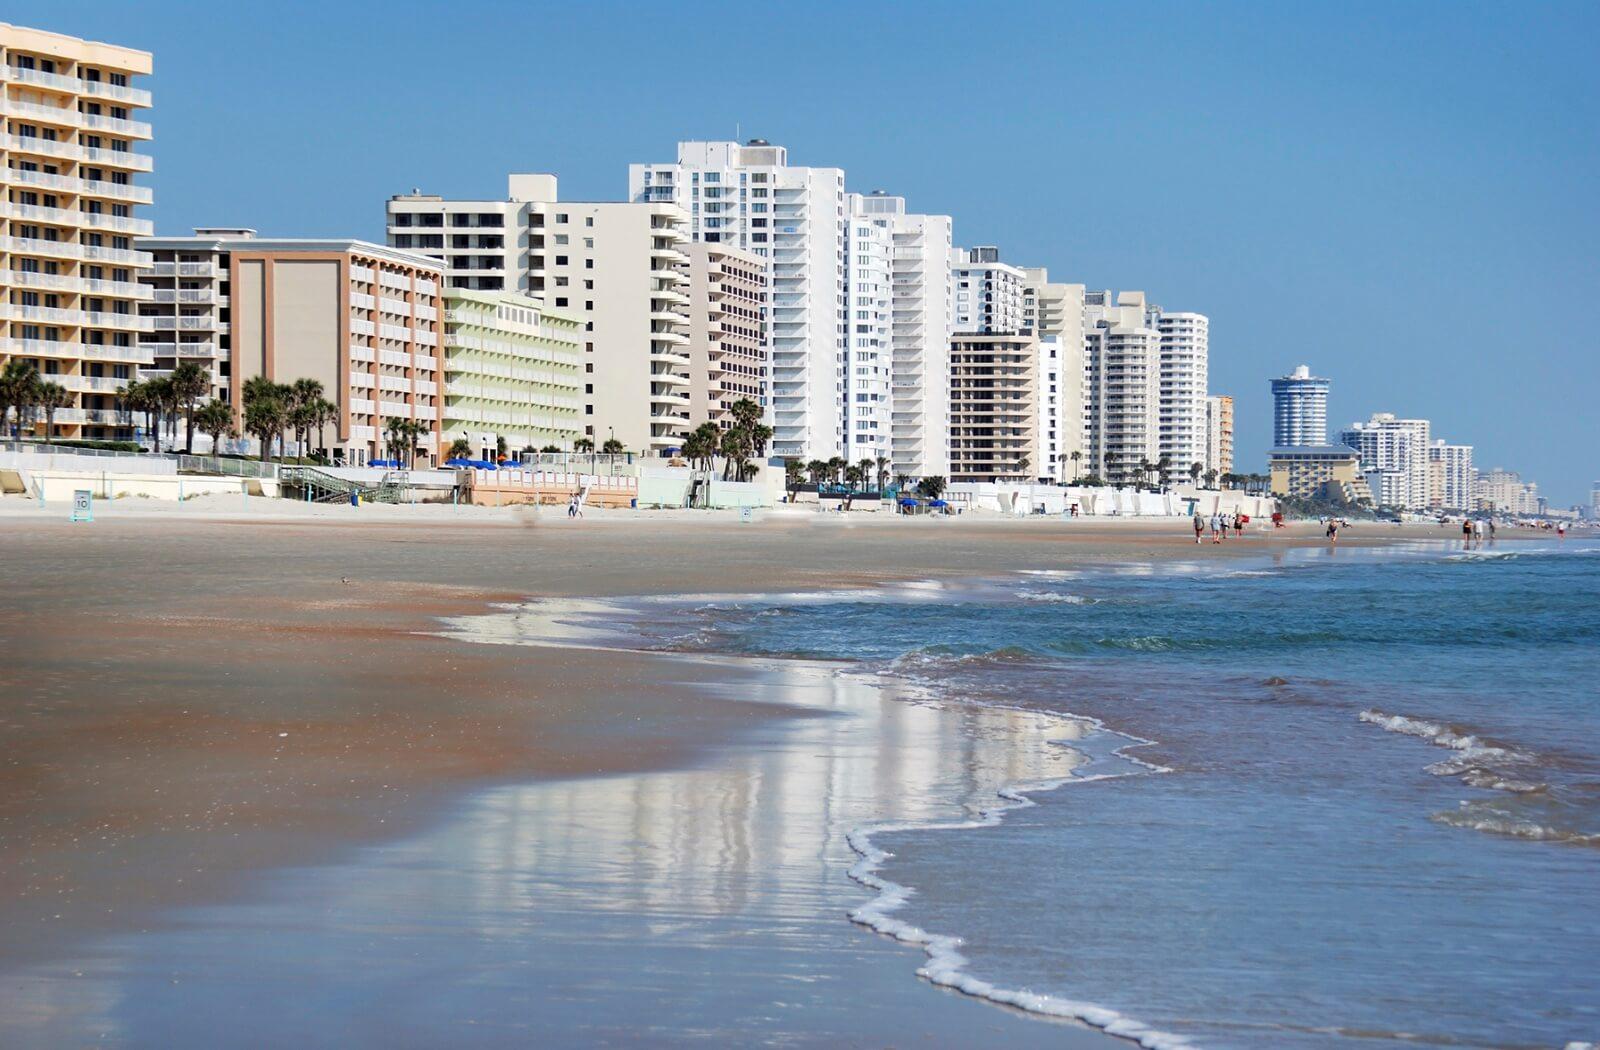 Onde ficar em Daytona Beach: Daytona Beach Shores